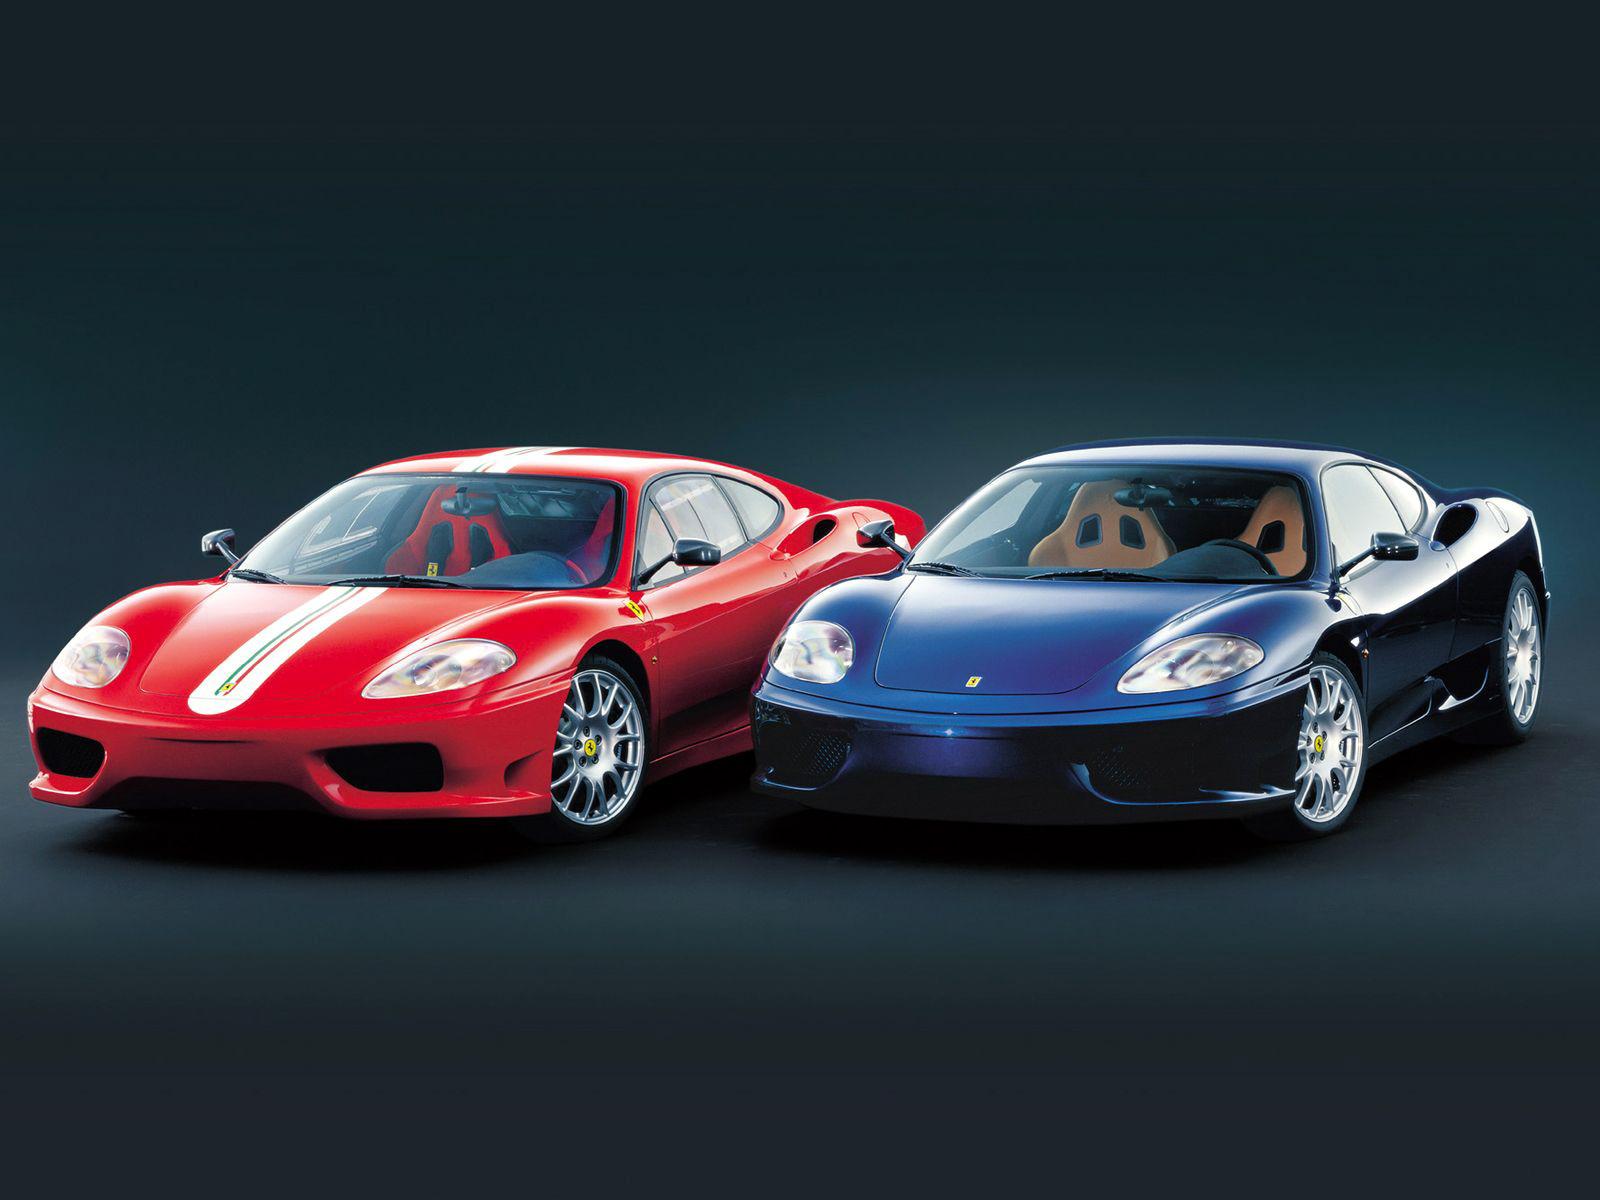 ferrari 8 10 λόγοι που η Ferrari 360 Challenge Stradale ανήκει στο γκαράζ των ονείρων μας Ferrari, Ferrari 360 Challenge Stradale, Ferrari 360 Modena, Ferrari Challenge Stradale, videos